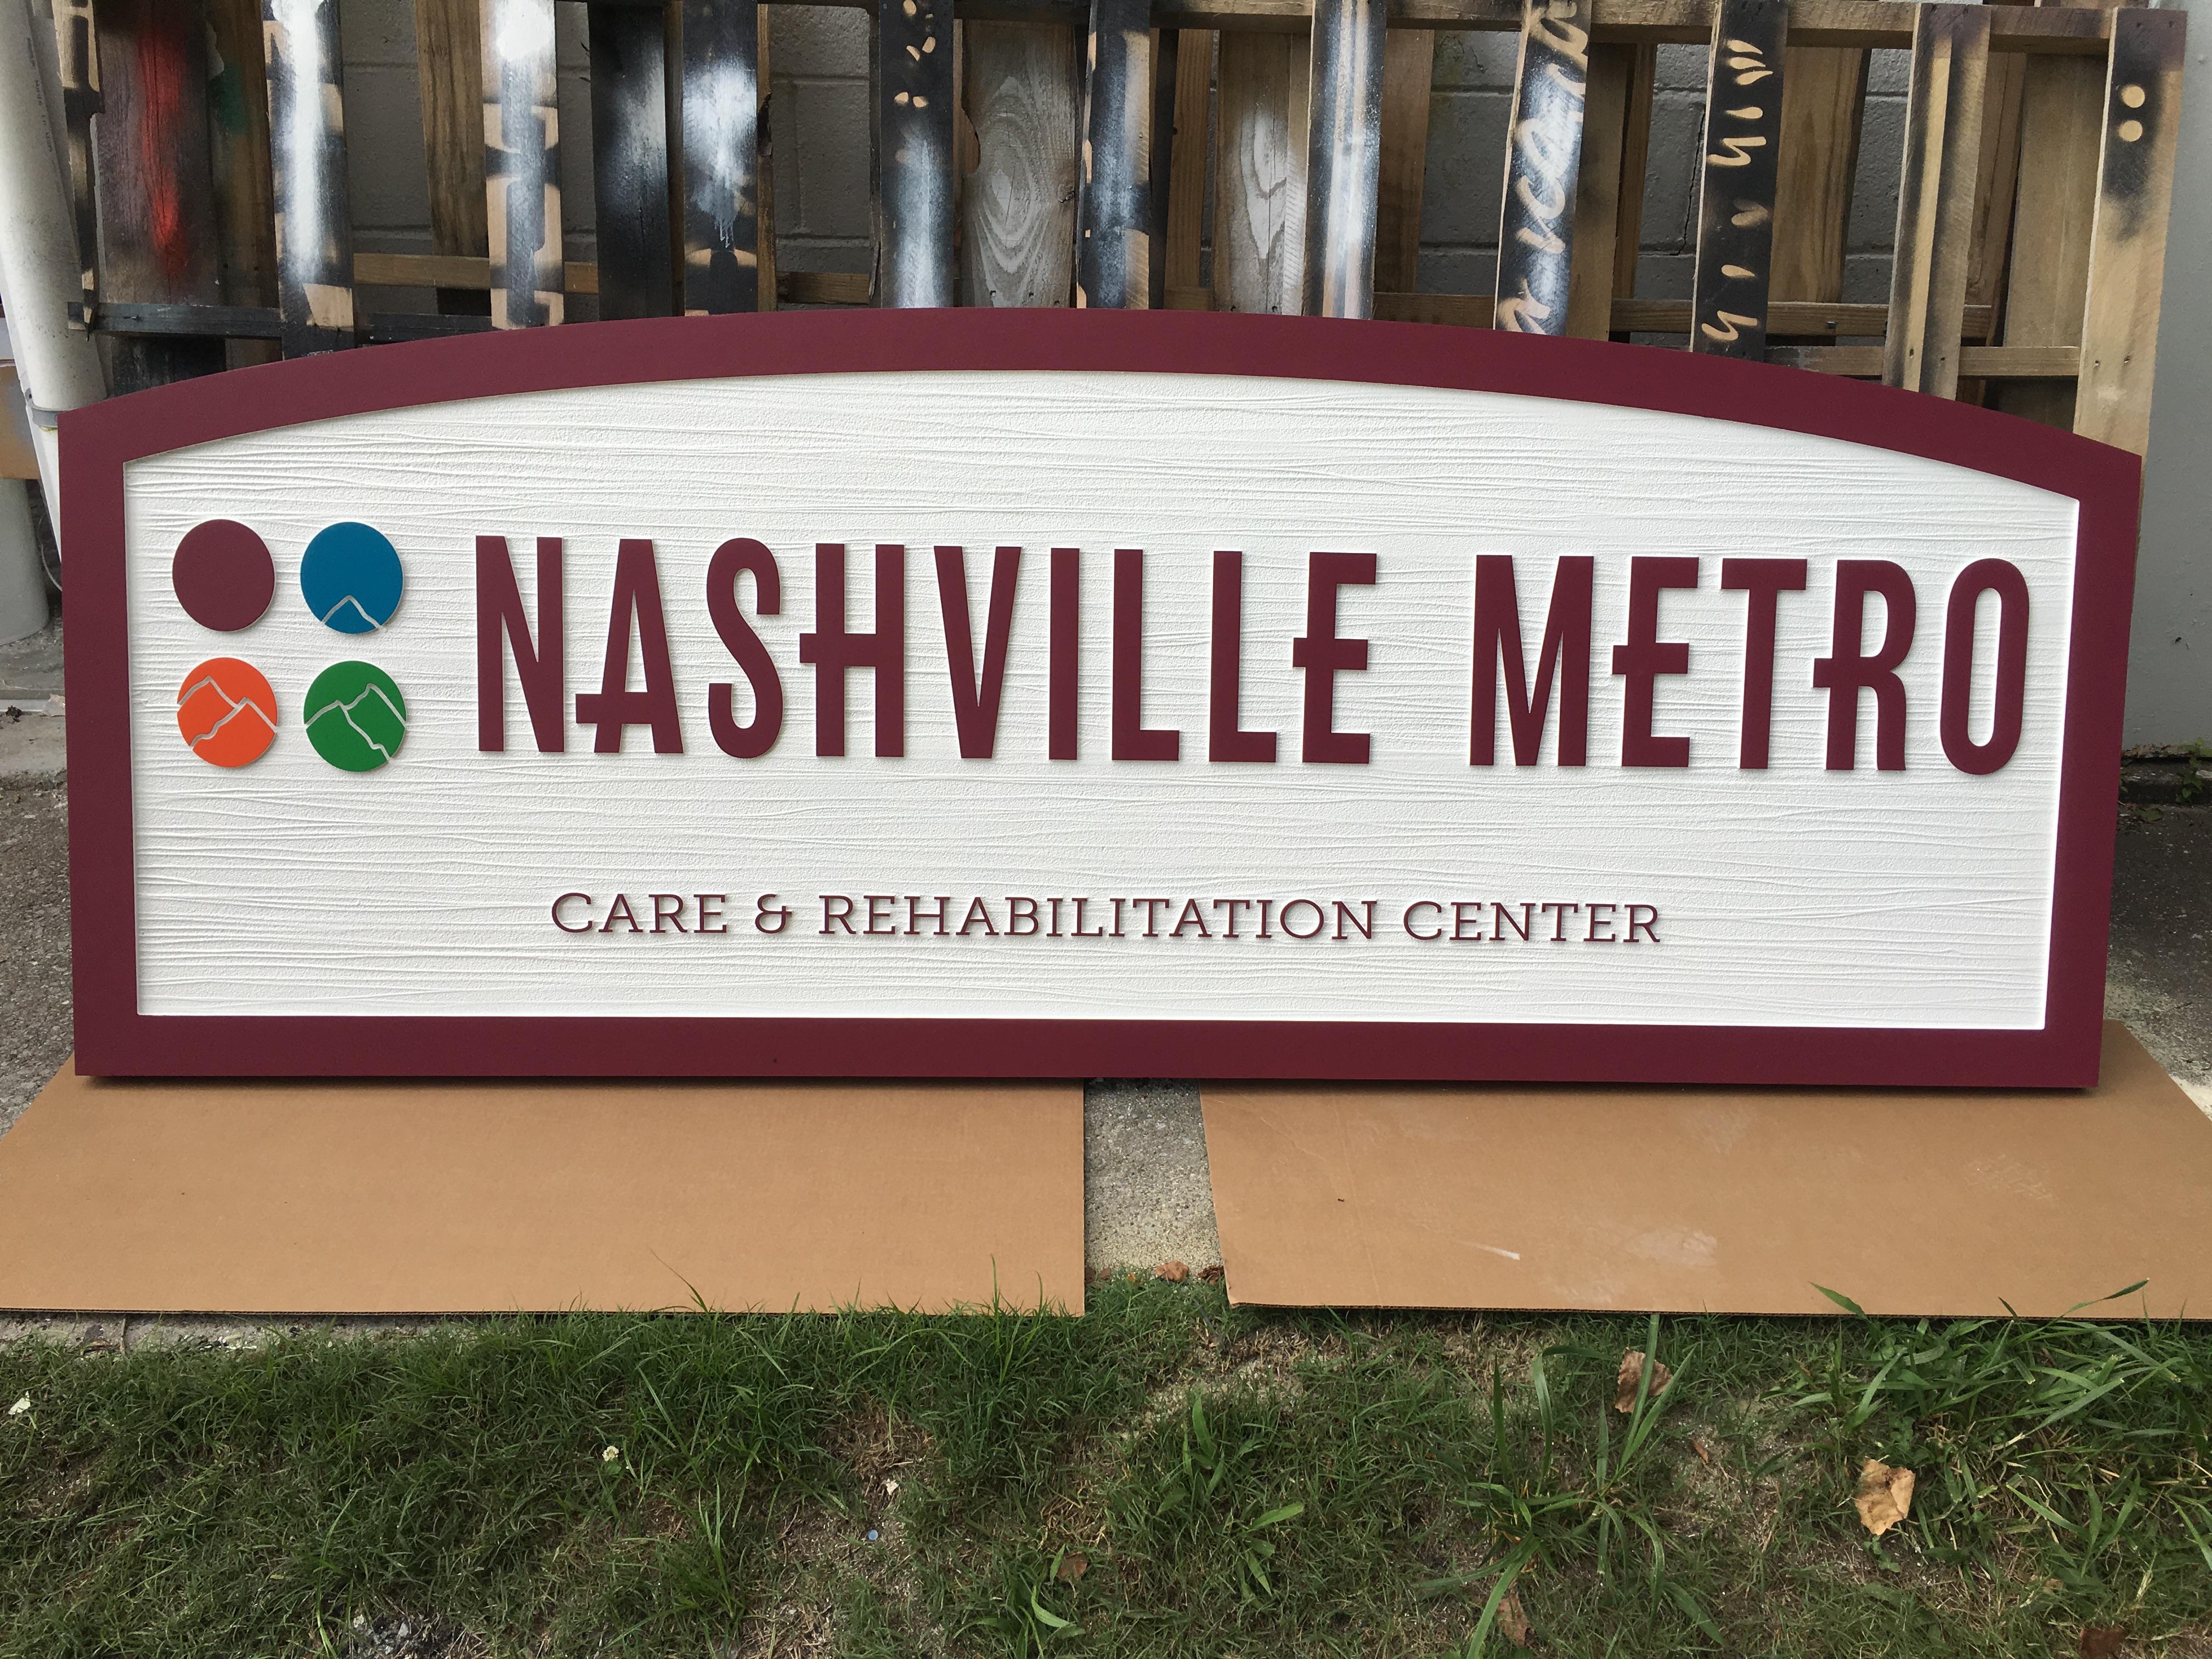 Nashvlle Metro Care & Rehab